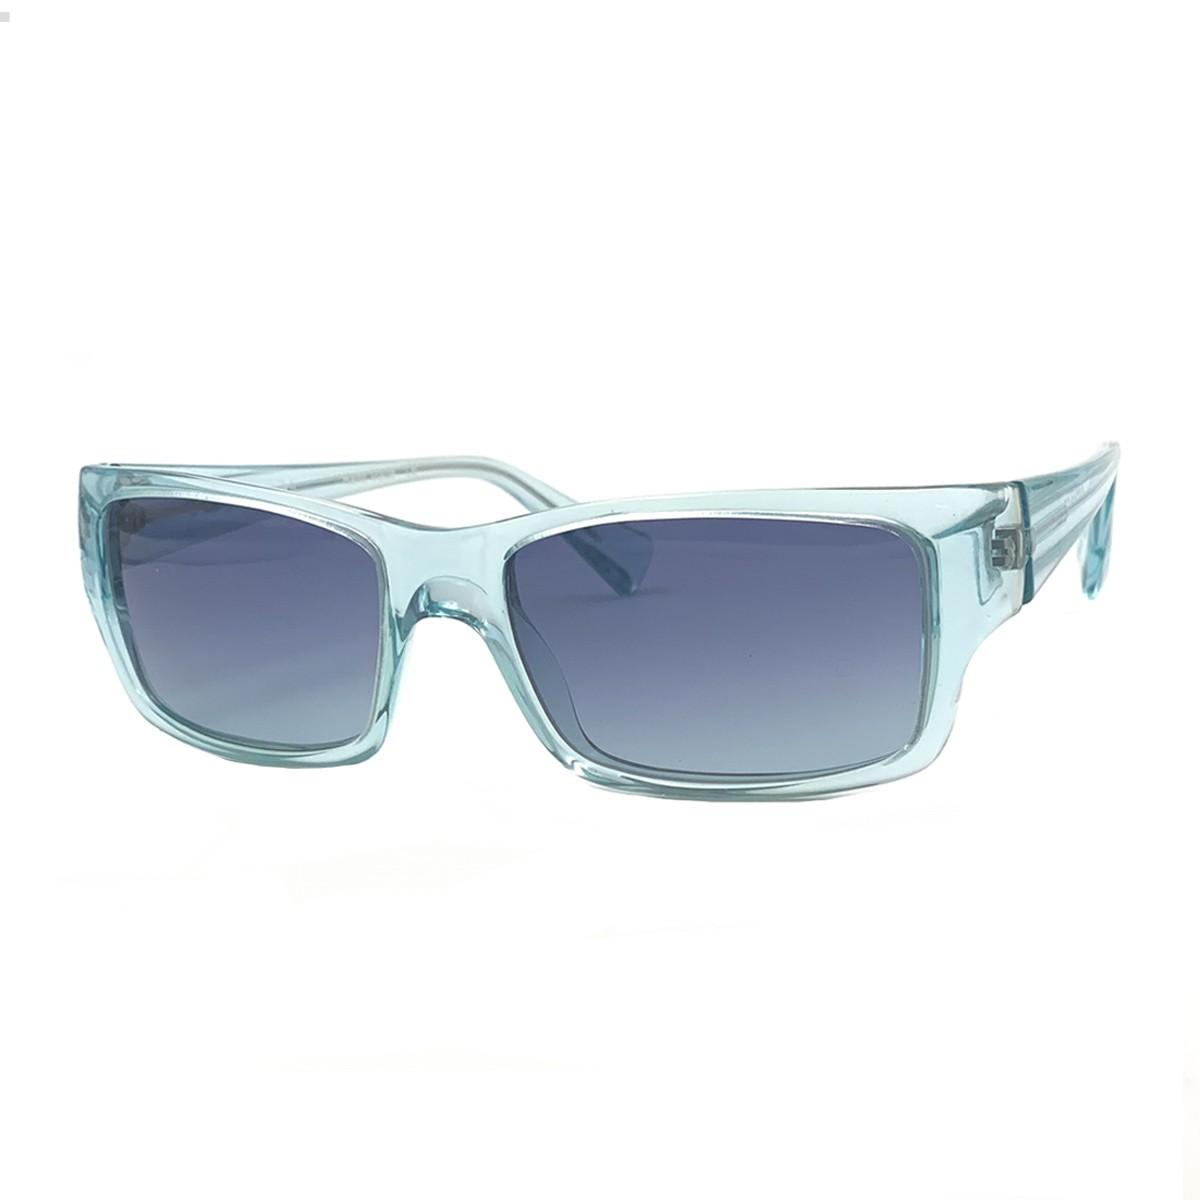 Alain Mikli A0641 | Women's sunglasses